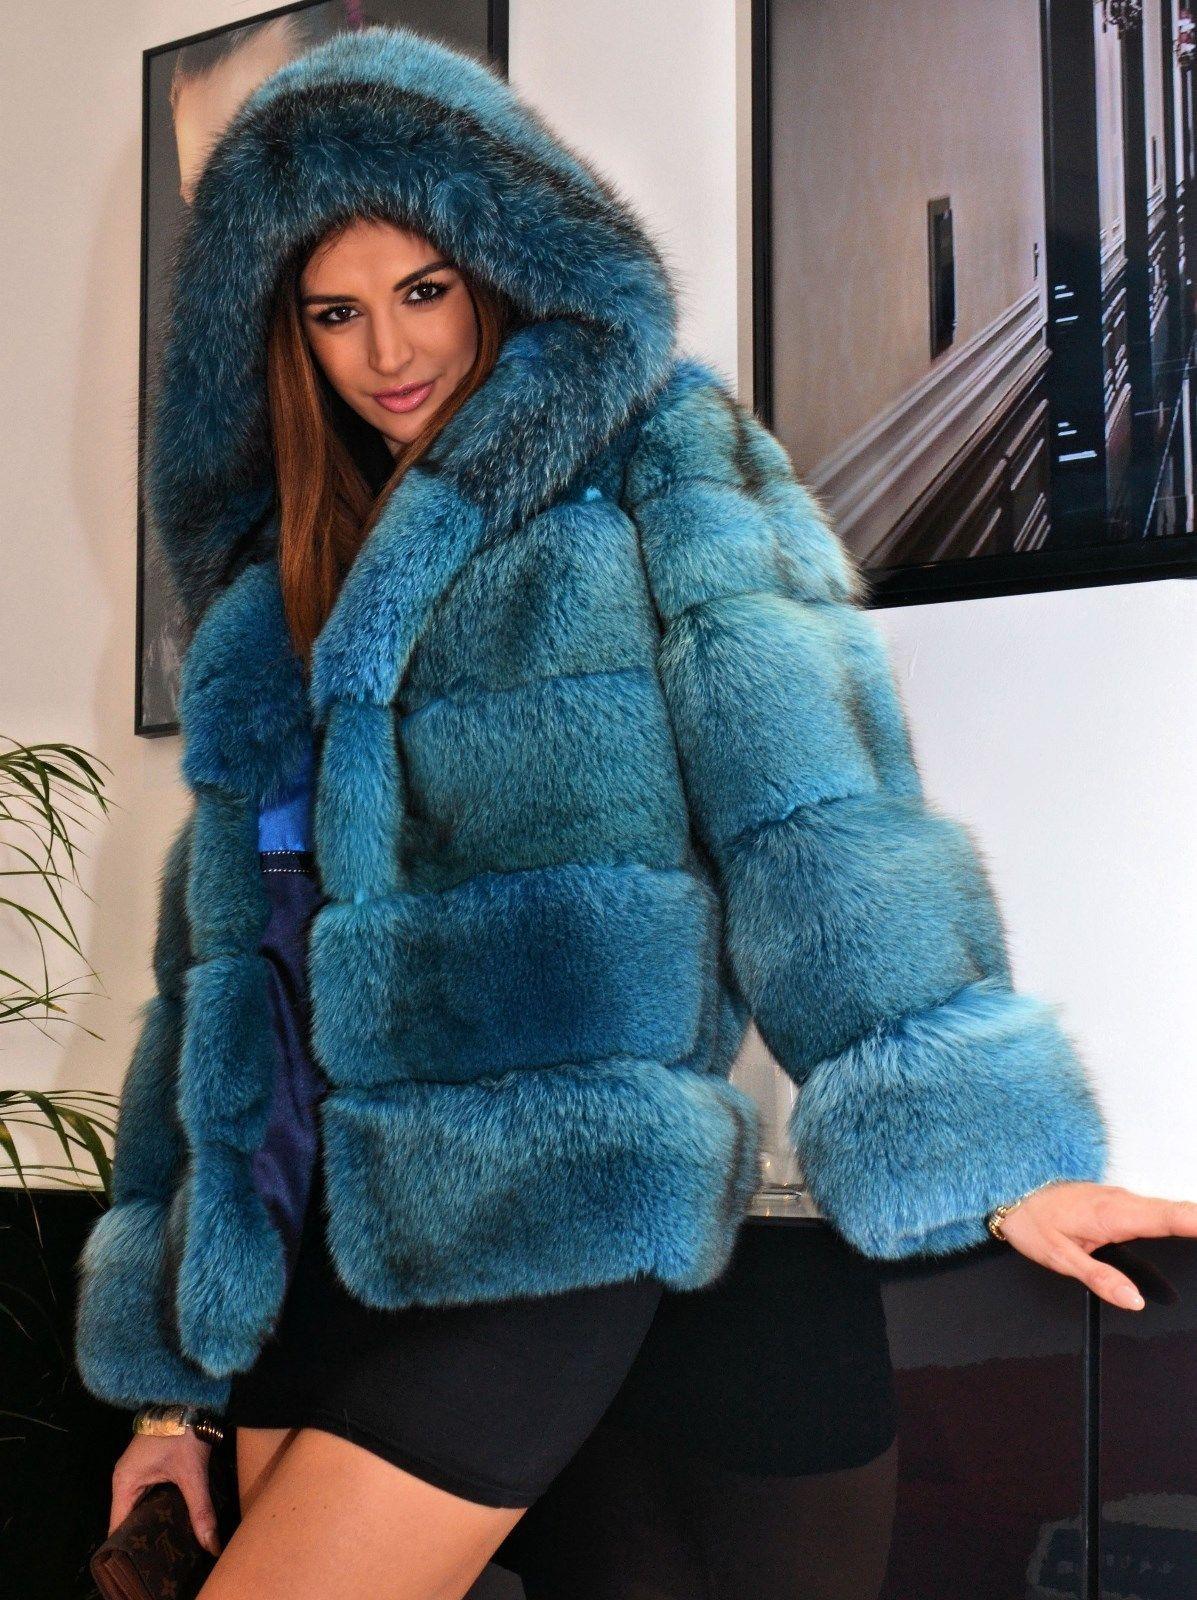 Ocean Blue Royal Saga Fox Fur Jacket Like Coat Silver Sable Mink Chinchilla Lynx   eBay